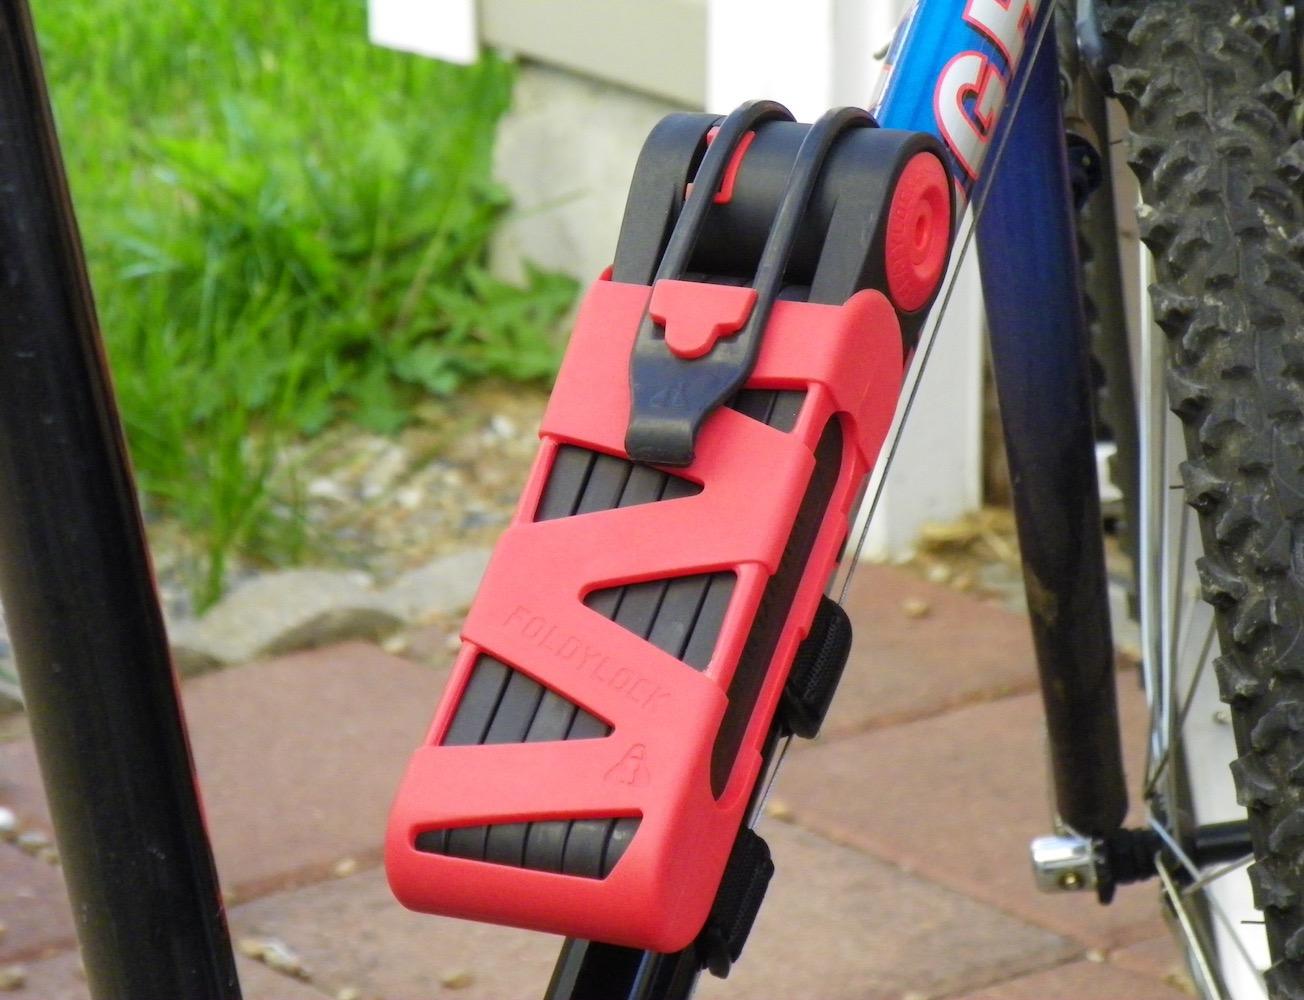 Foldylock – The Folding Bike Lock